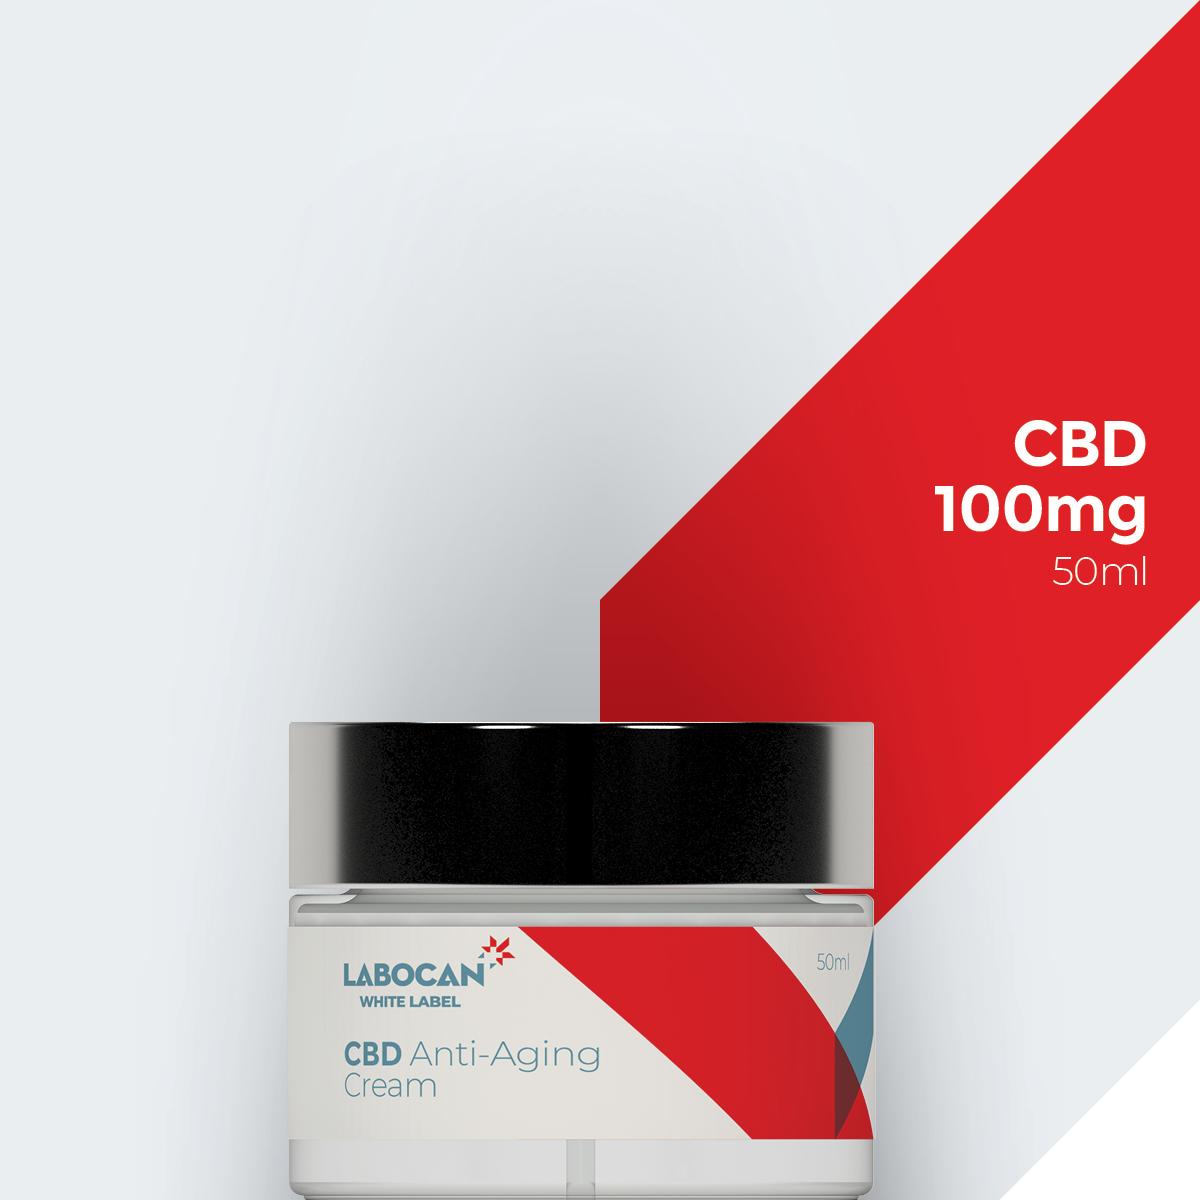 White Label CBD Cosmetics